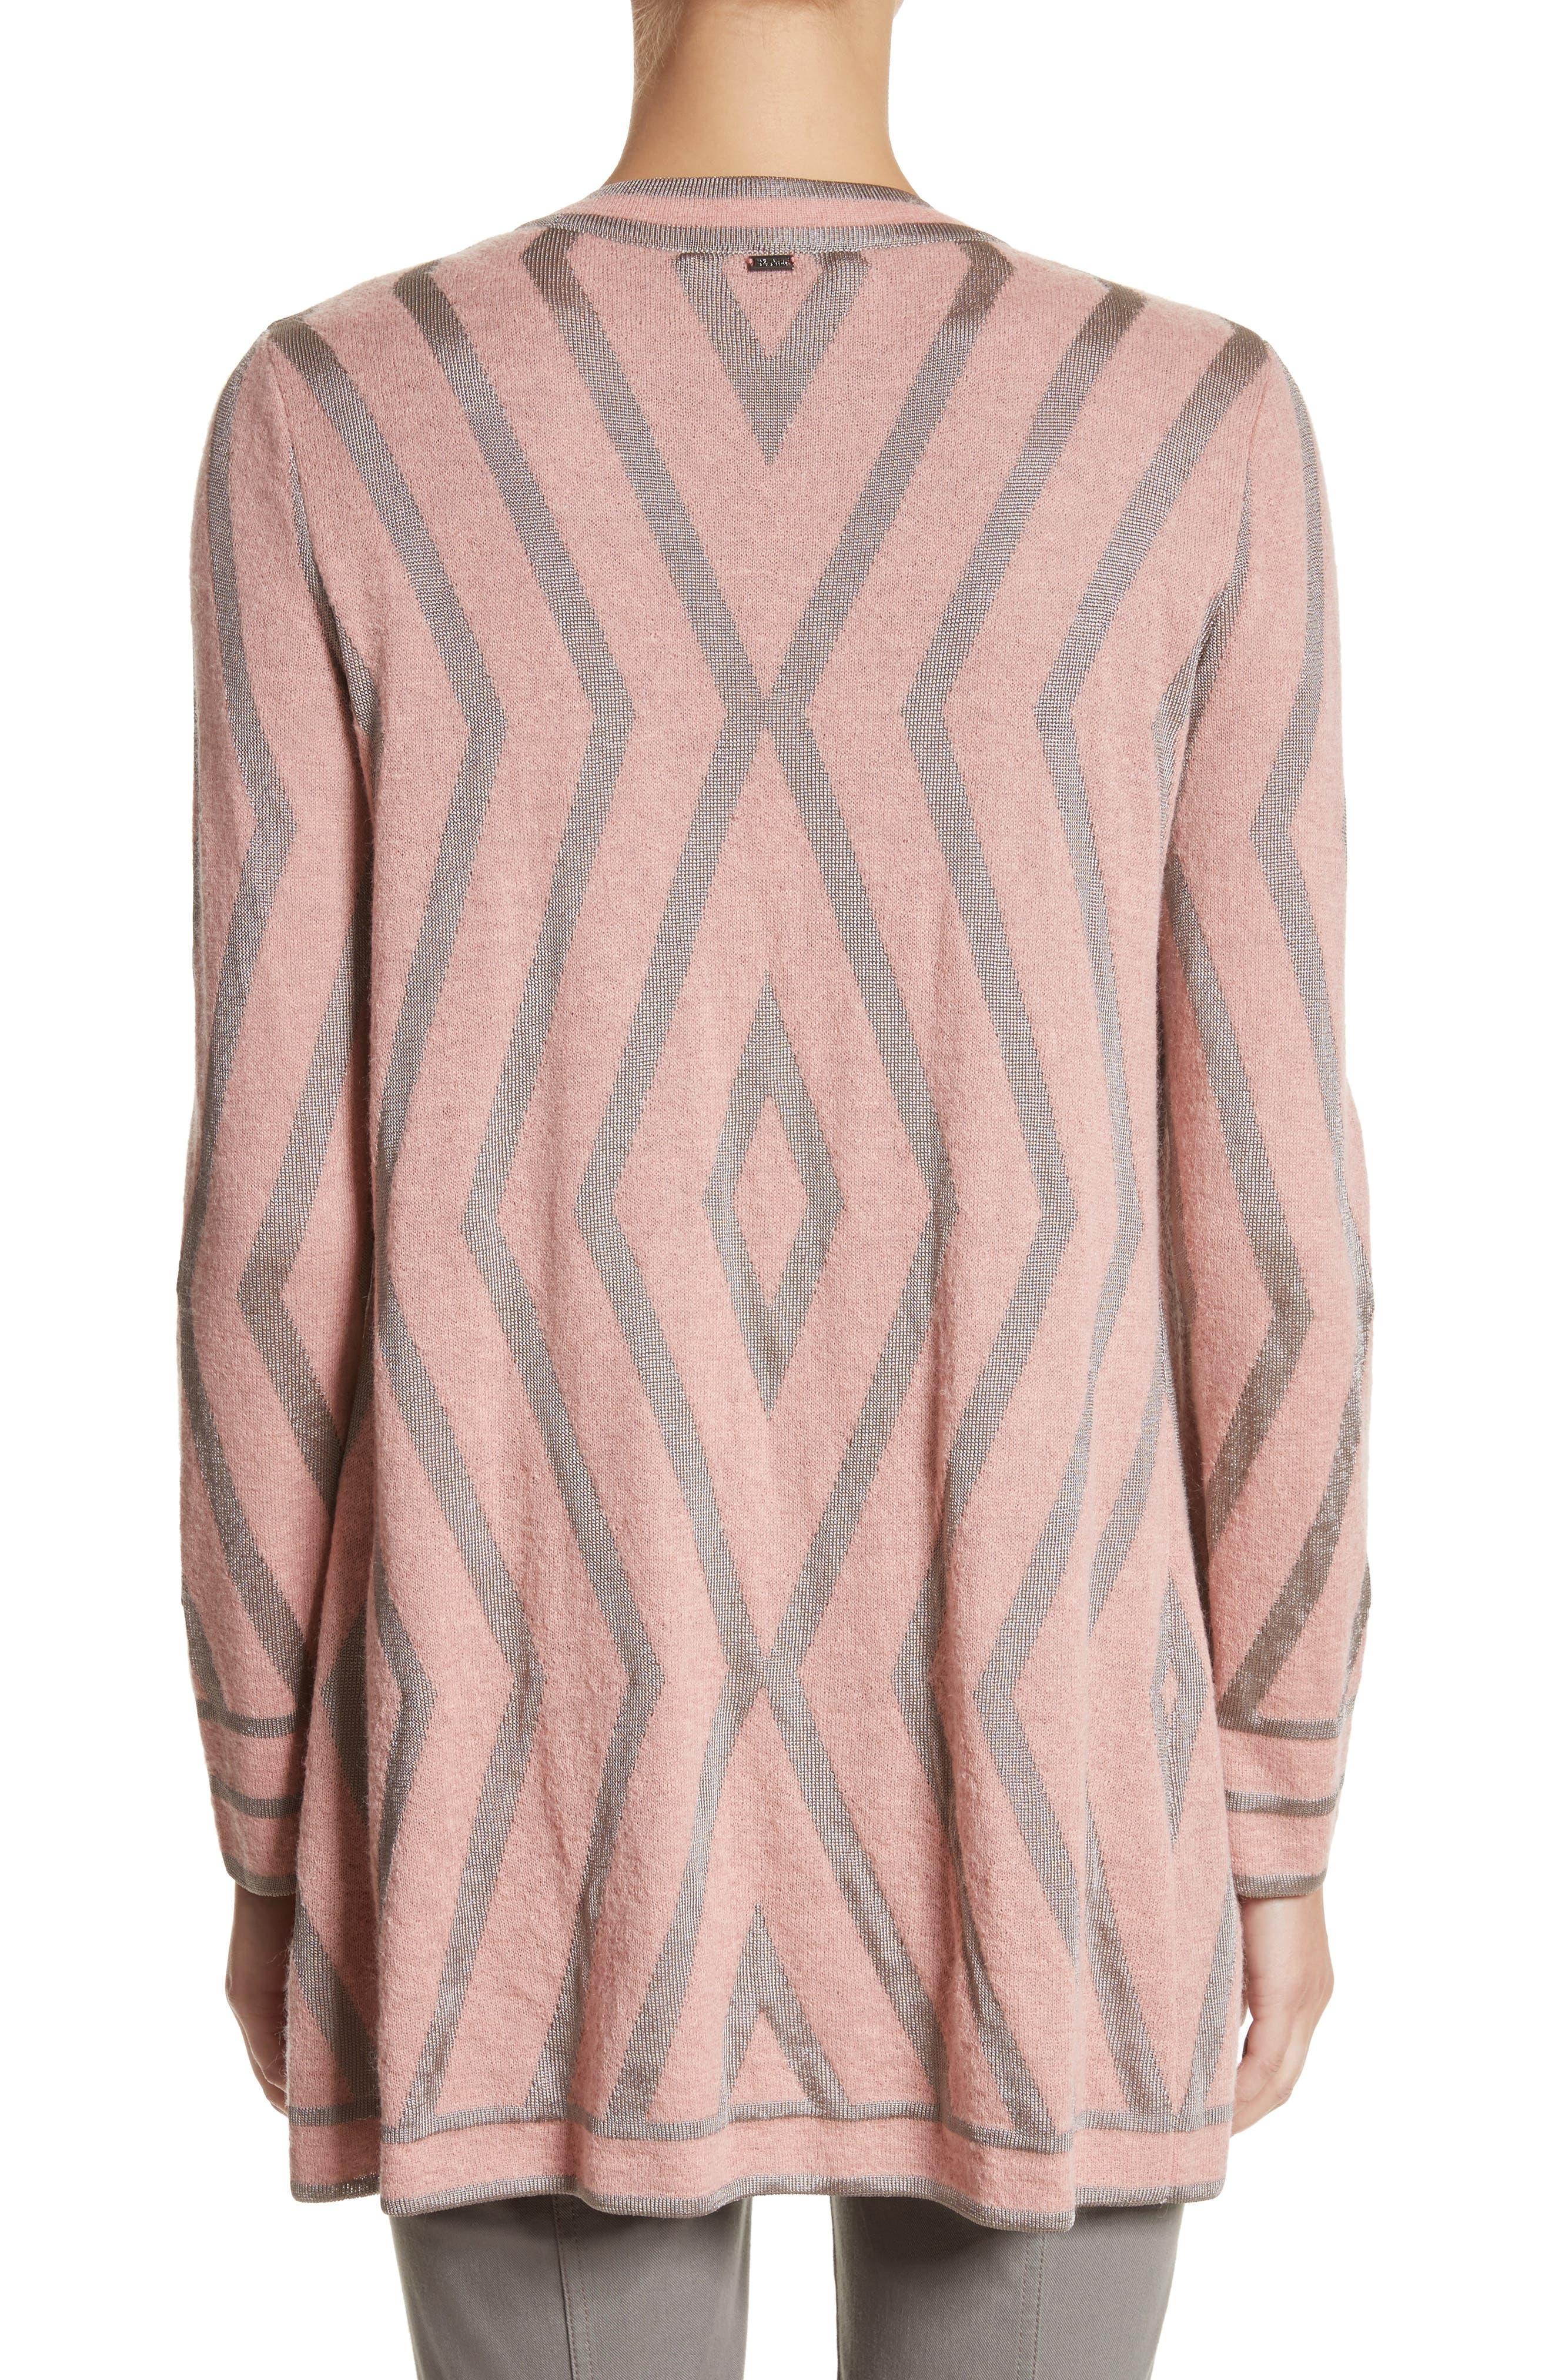 Alternate Image 2  - St. John Collection Matte Shine Geo Jacquard Knit Cardigan